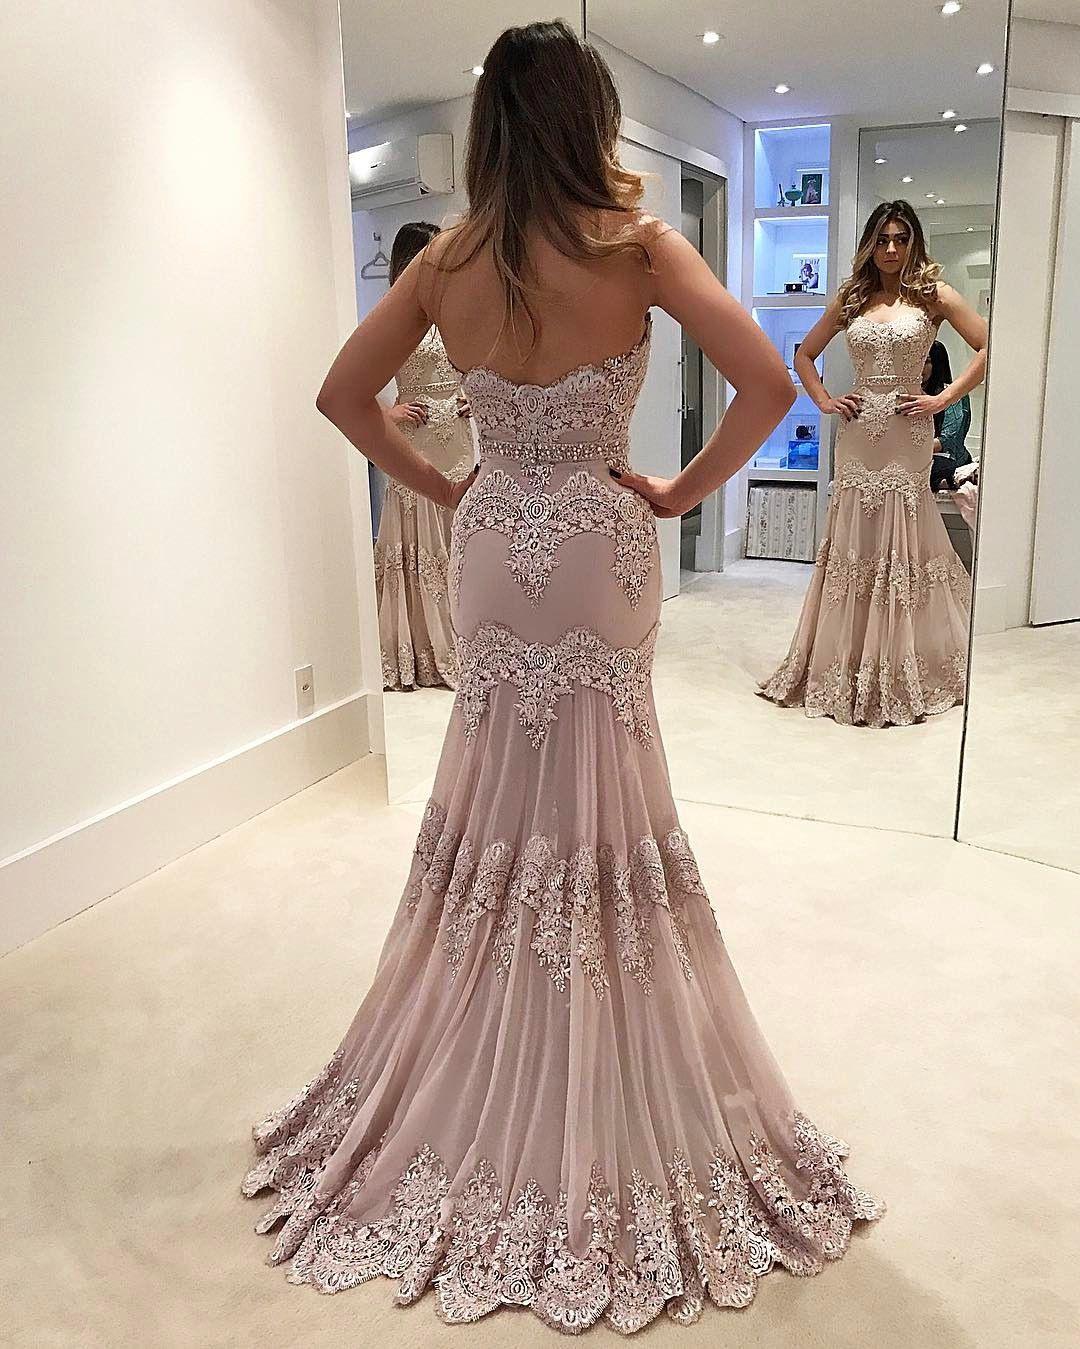 Abend Perfekt Abendkleid Extra Lang GalerieAbend Perfekt Abendkleid Extra Lang Boutique